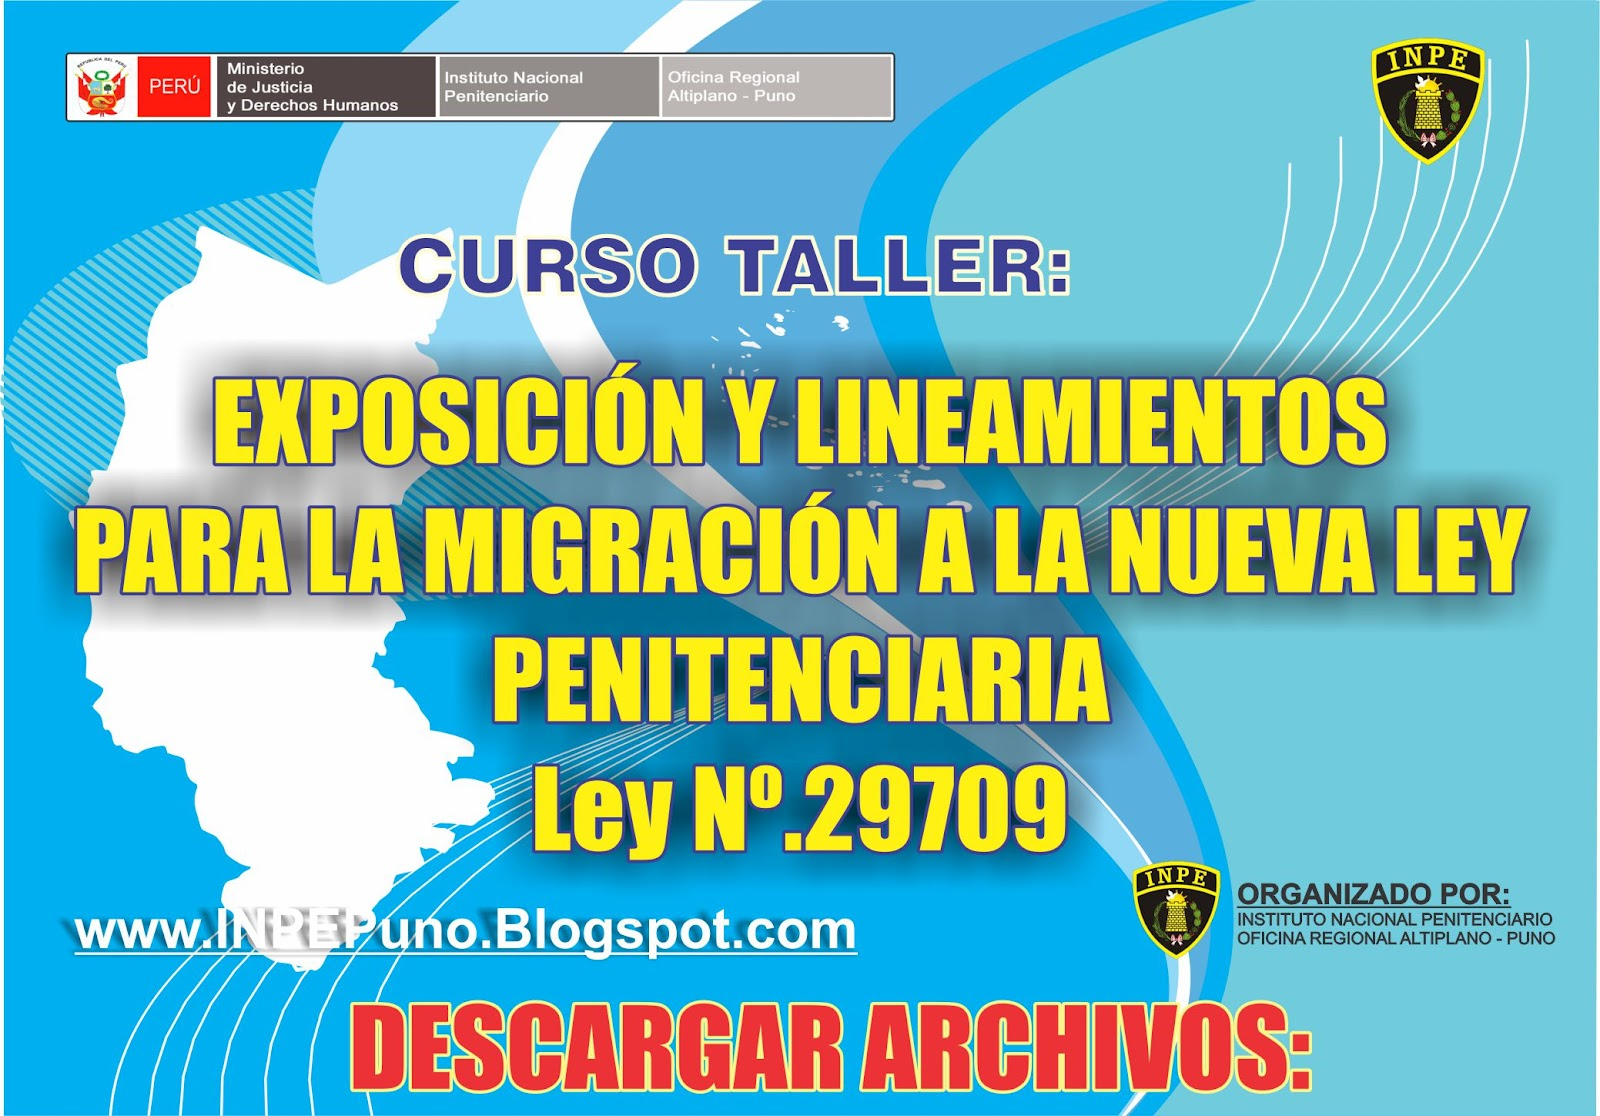 Inpe oficina regional altiplano puno descargar for Ley penitenciaria